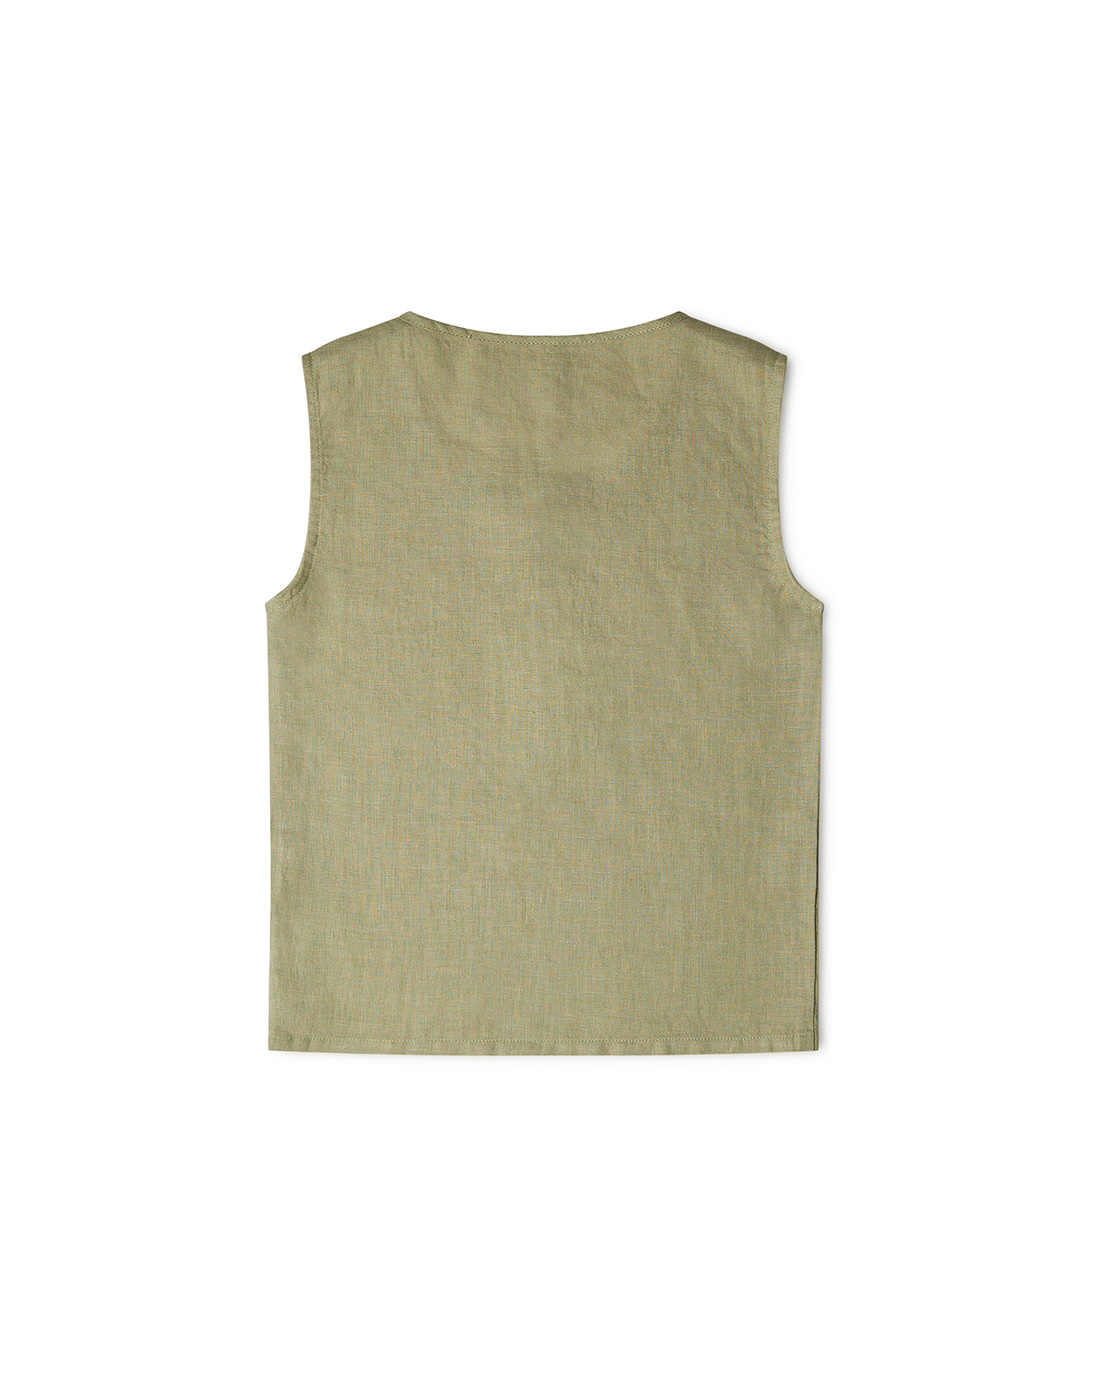 Matona - linen tanktop FAWN - 100% linen - sage - 1 to 6 years